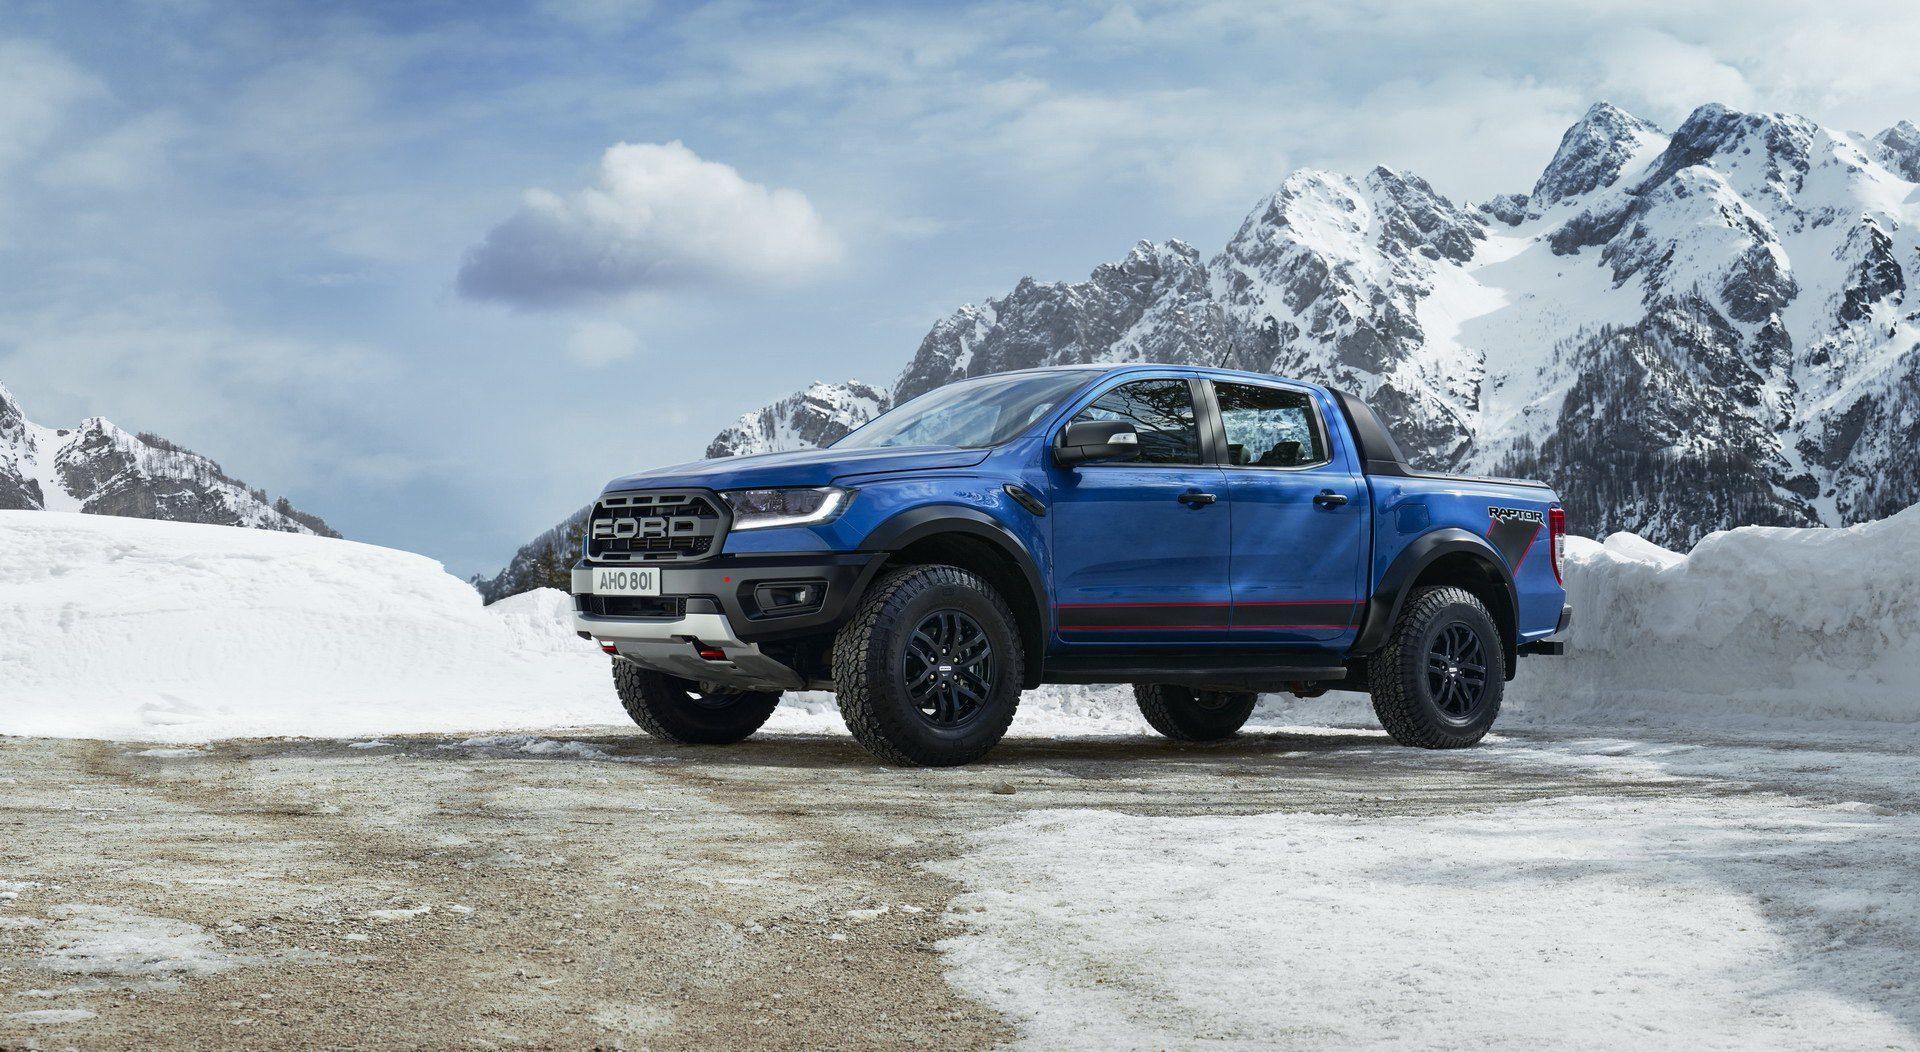 Ford_Ranger_Raptor_Special_Edition-0004